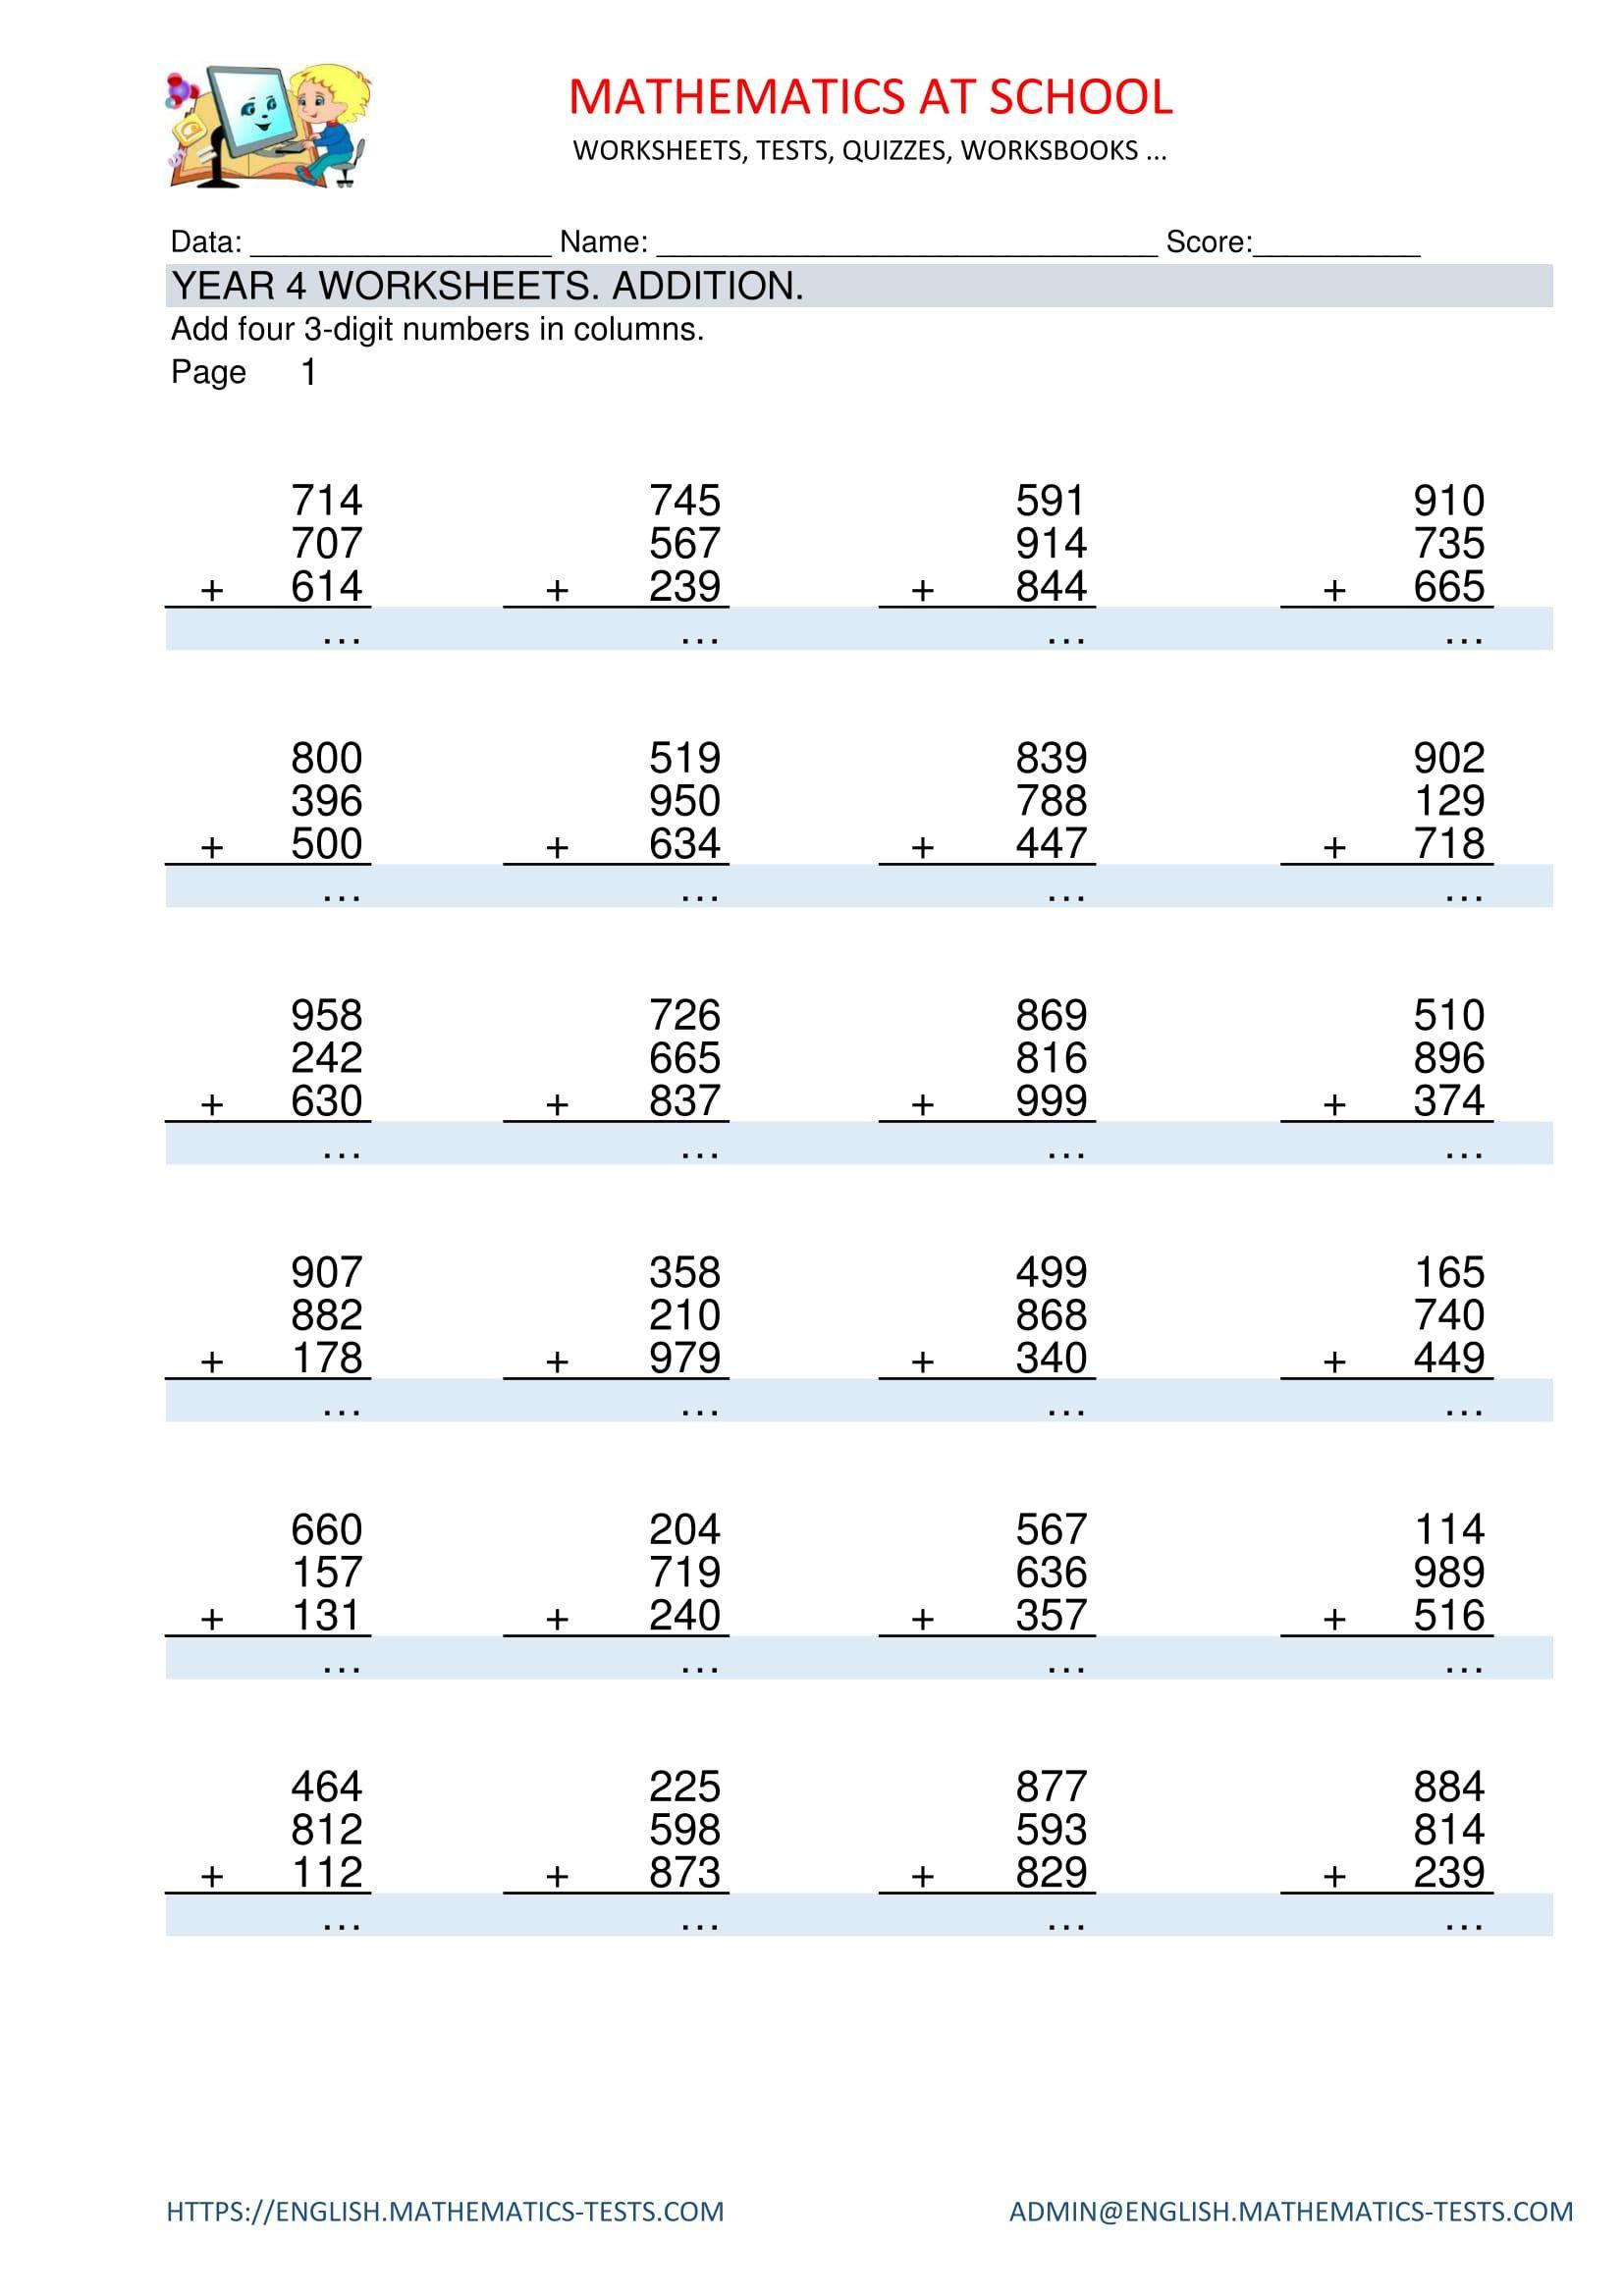 Pinenglish Maths On Year 4 Maths Worksheets And Printable Pdf | 4Th Grade Math Worksheets Printable Pdf